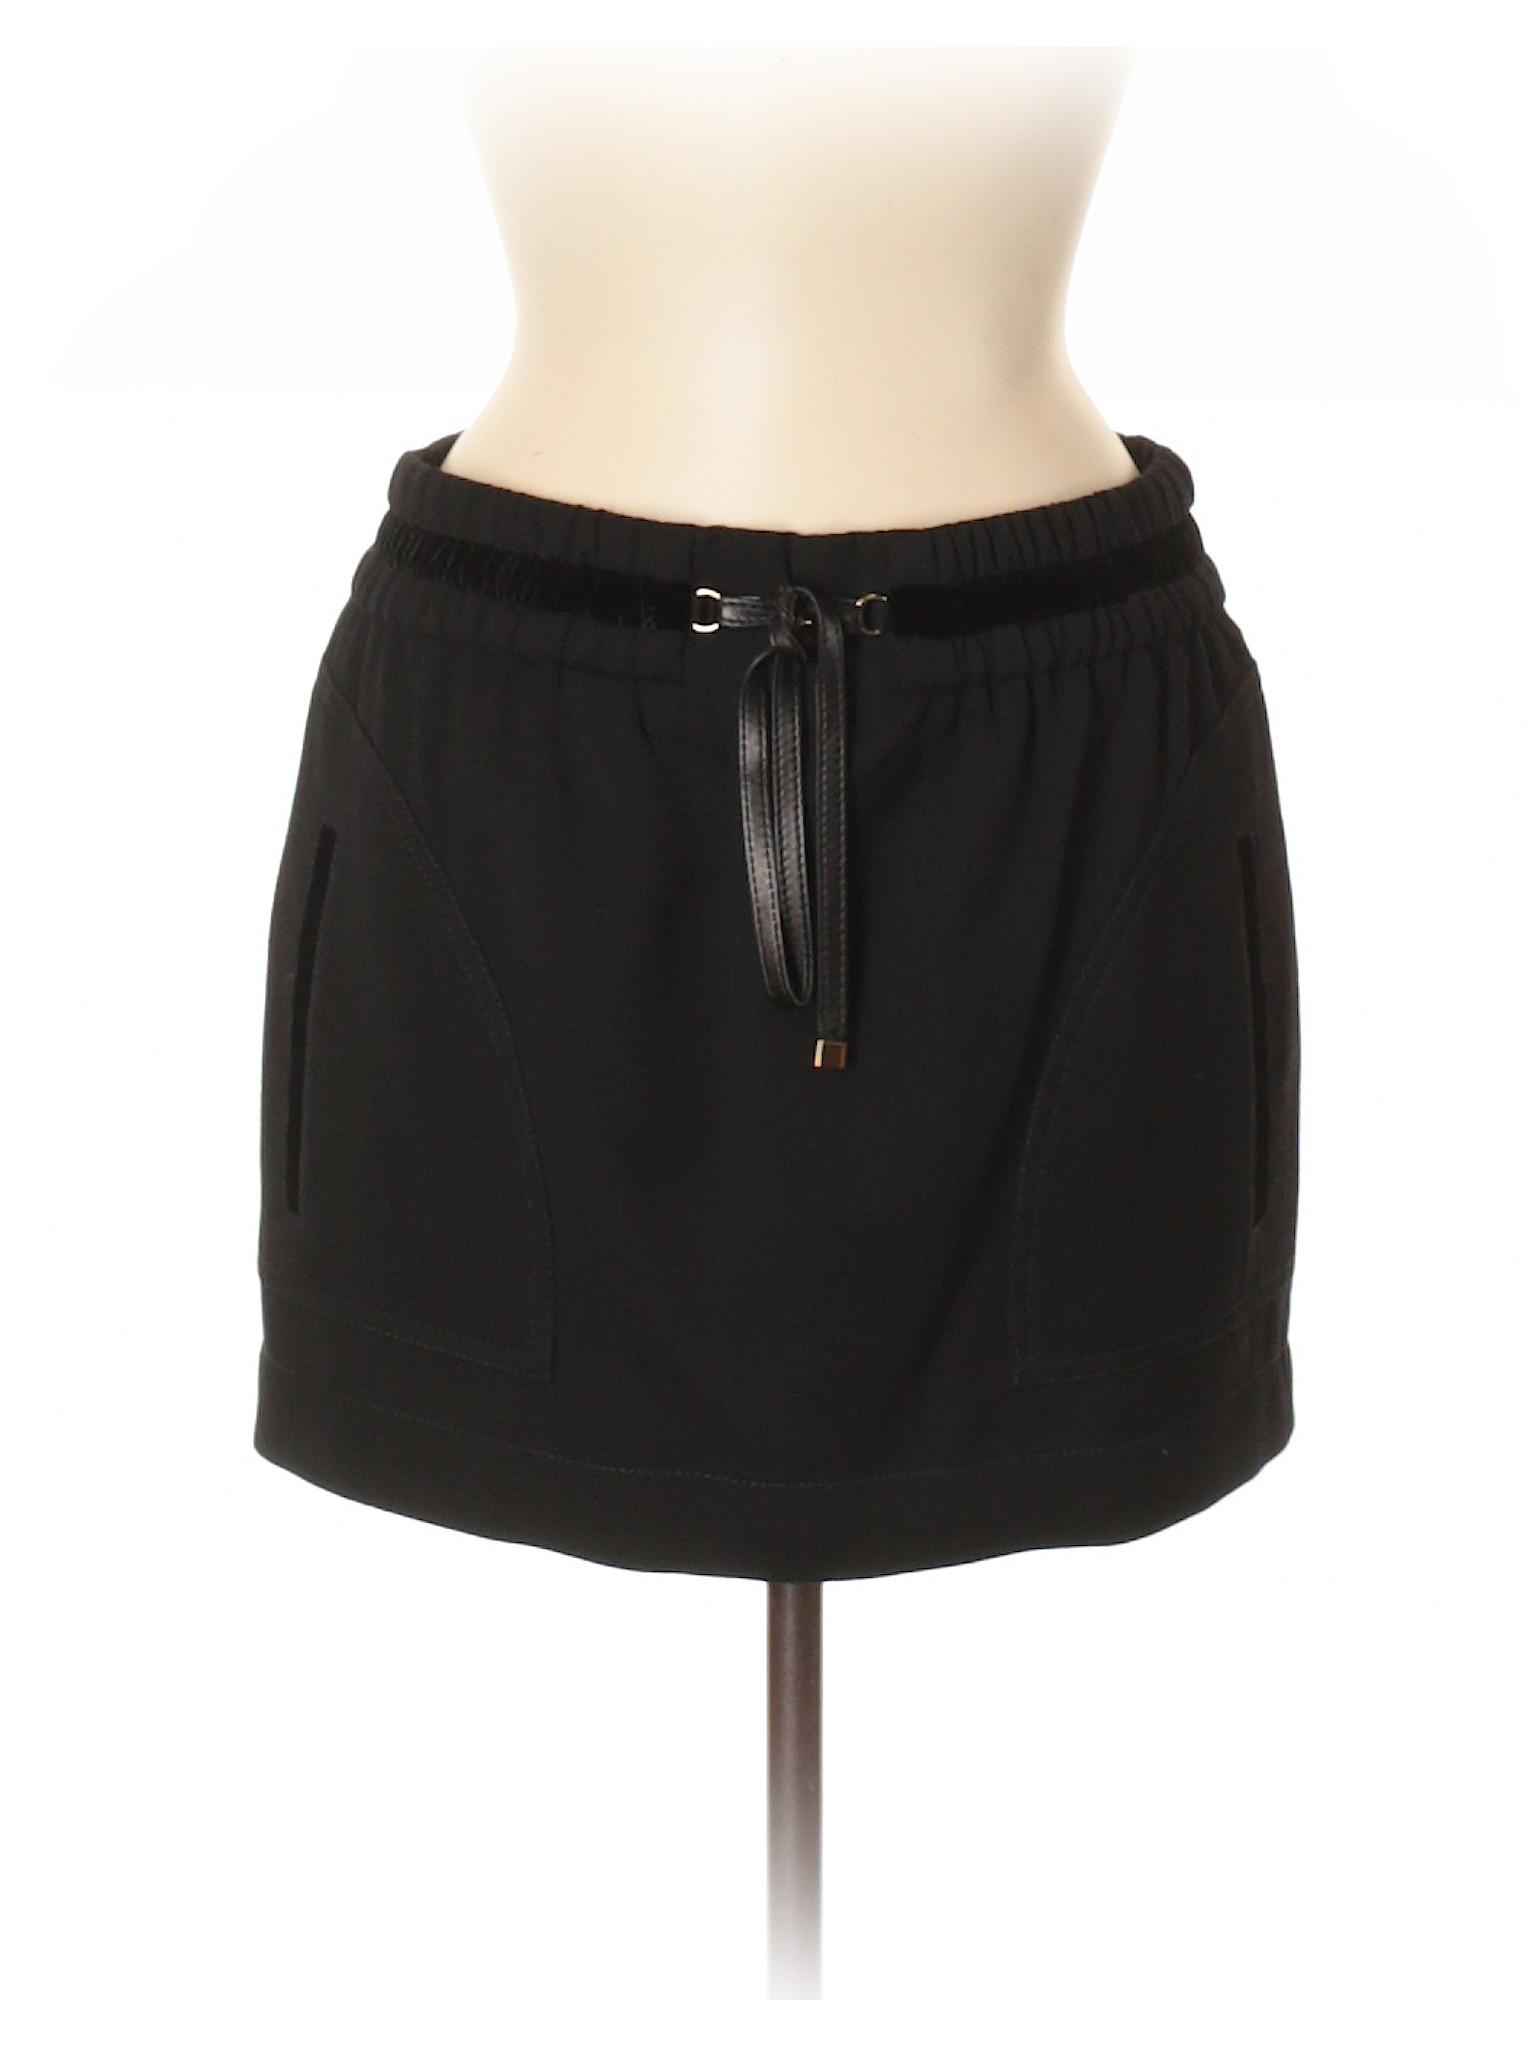 Wool Boutique Skirt Boutique Wool Boutique Skirt Wool Skirt Wool Boutique p7Uqwf